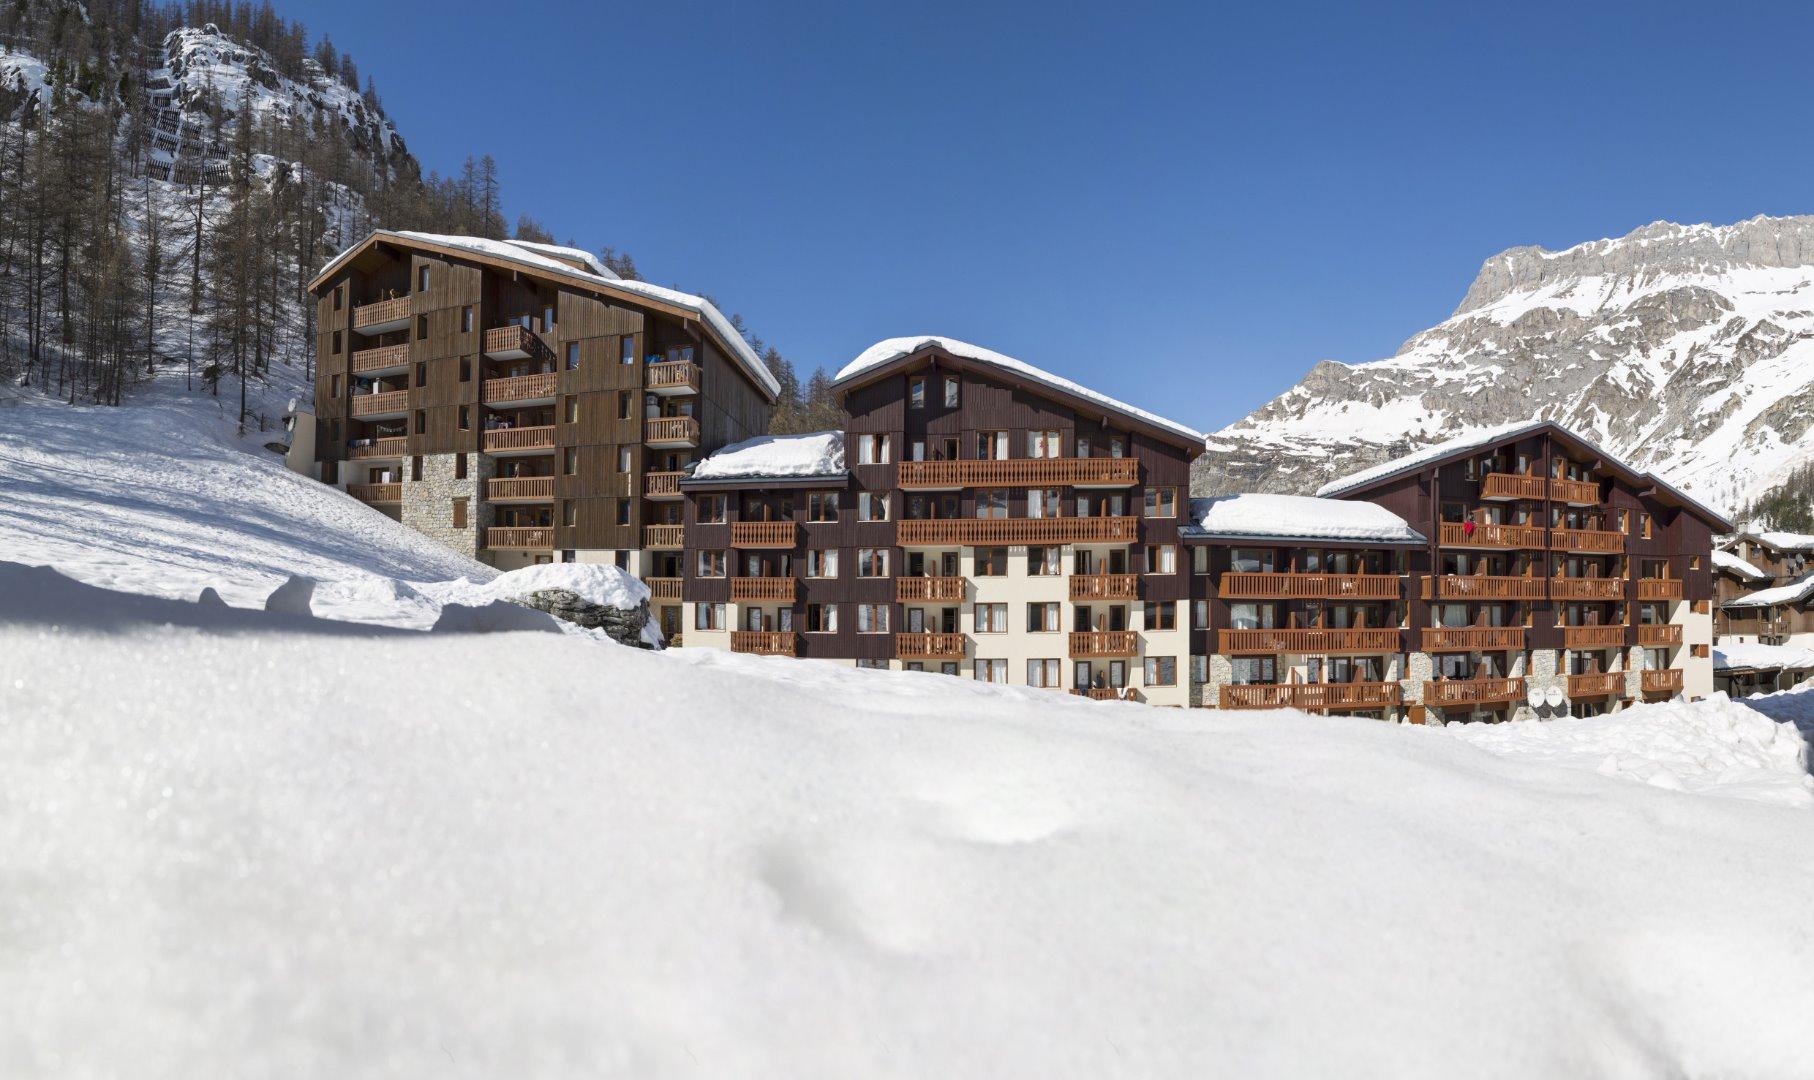 Residence jardins de la balme a Val d'isere